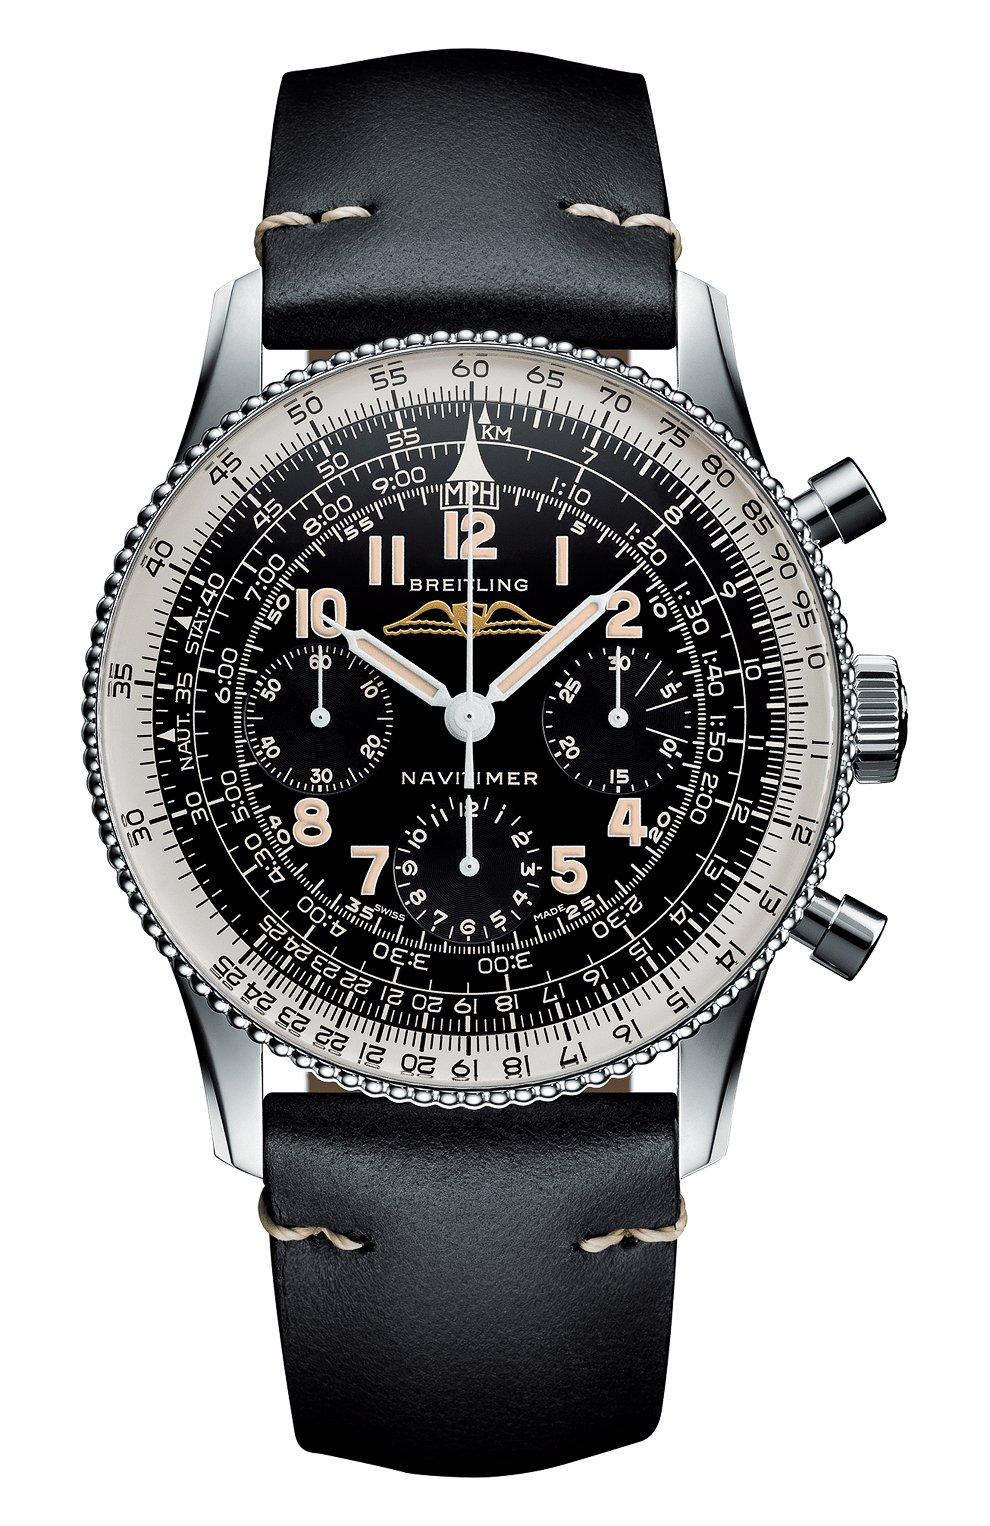 Мужские часы navitimer ref. 806 1959 re-edition BREITLING черного цвета, арт. AB0910371B1X1 | Фото 1